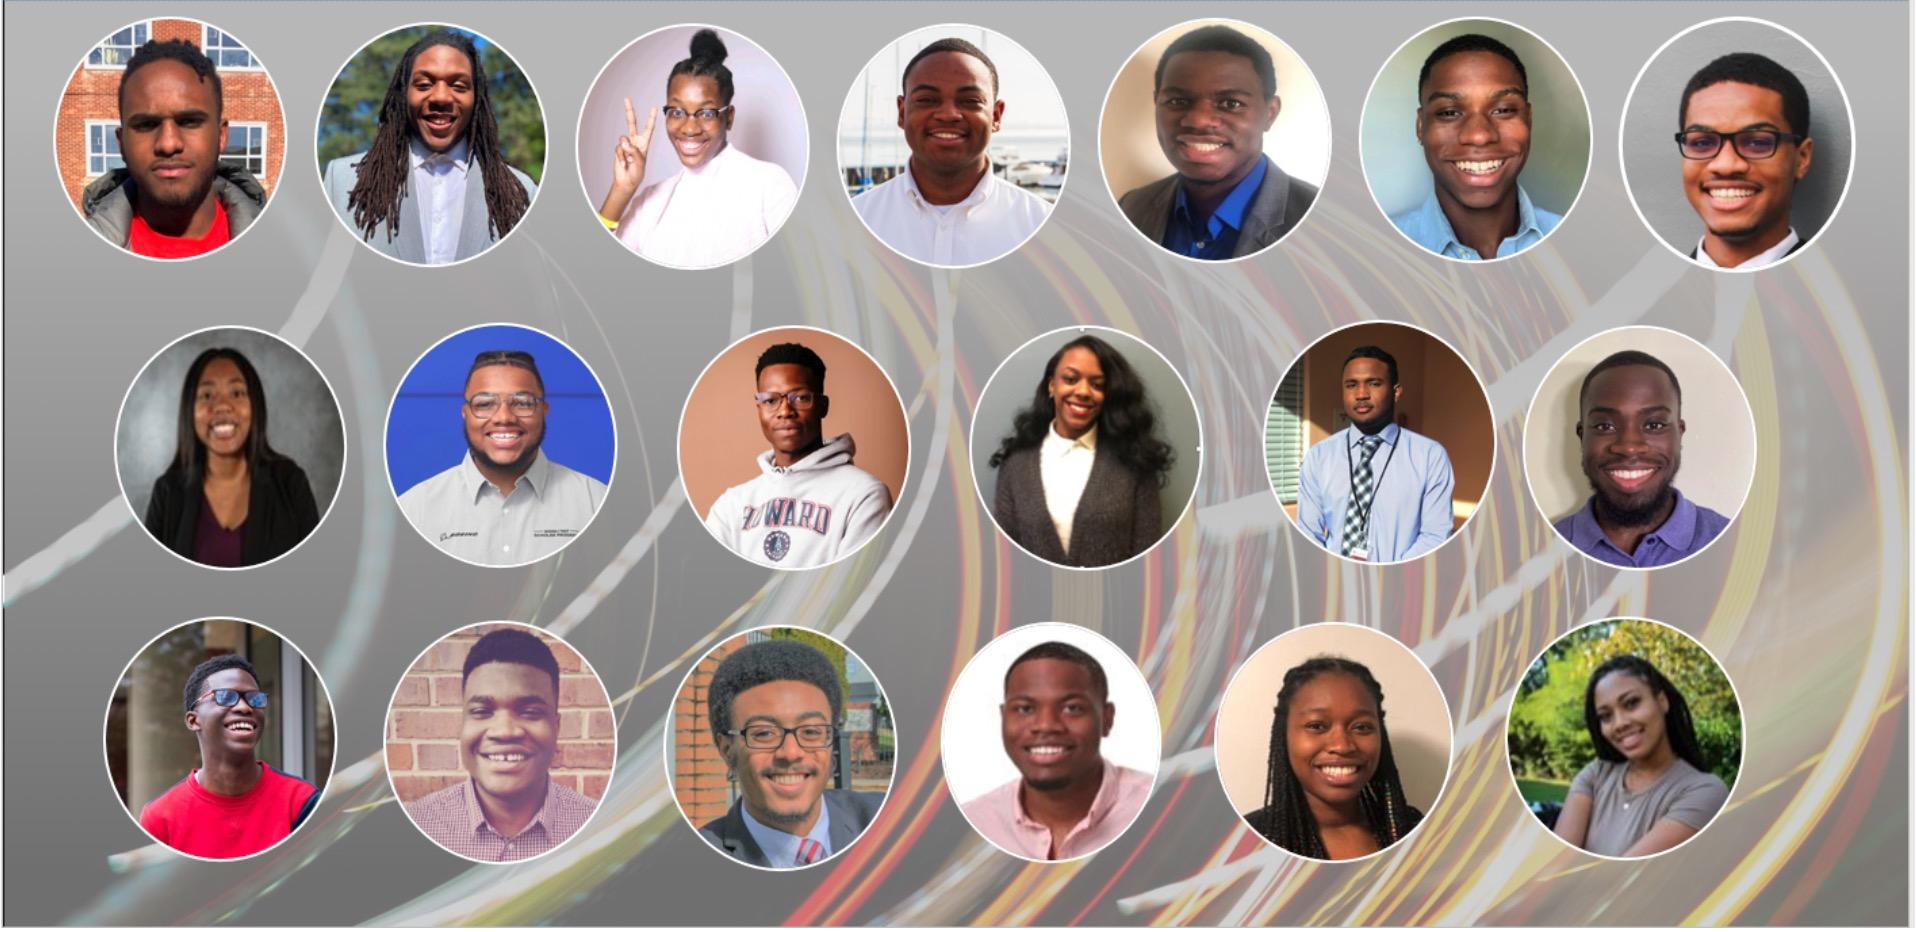 headshots of the first cohort of Autodesk HBCU Tech Program students.